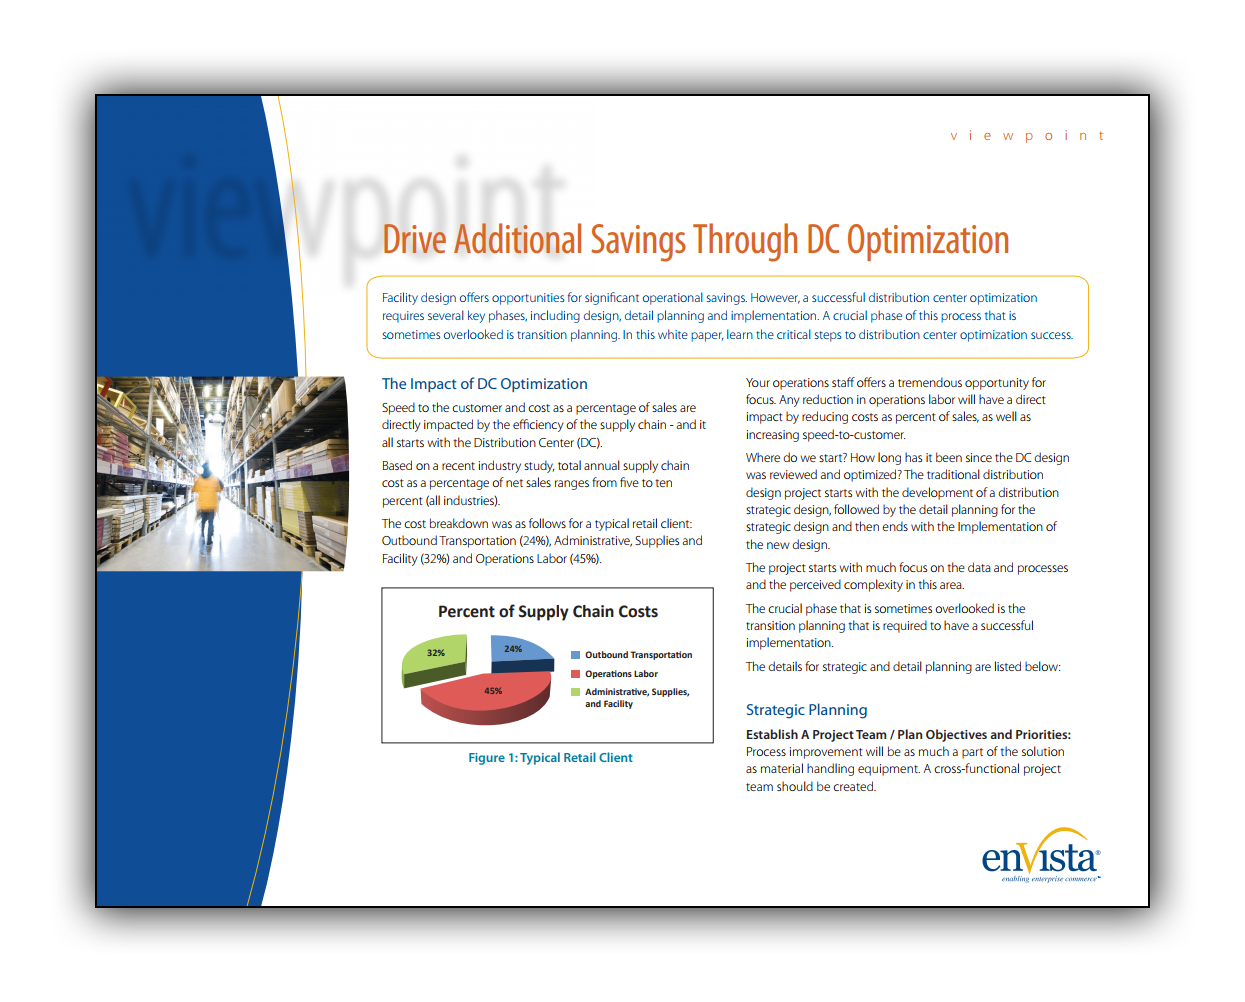 Image_drive-additional-savings-through-DC-optimizatoin.png